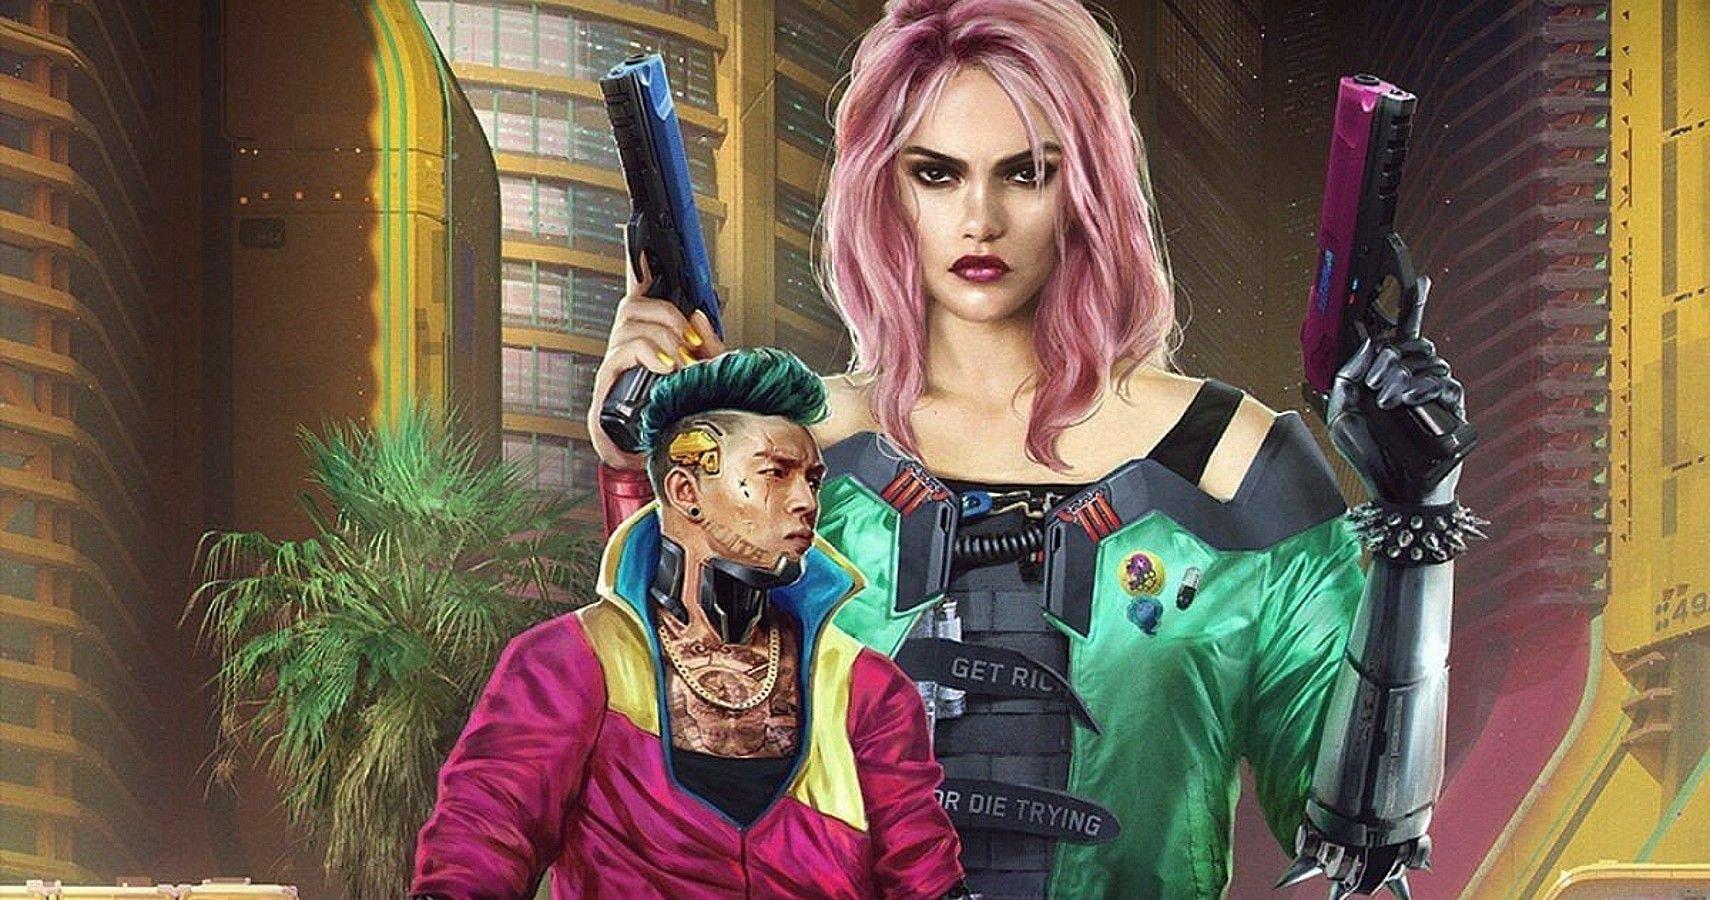 Street Kid Is The Most Popular Lifepath In Cyberpunk 2077